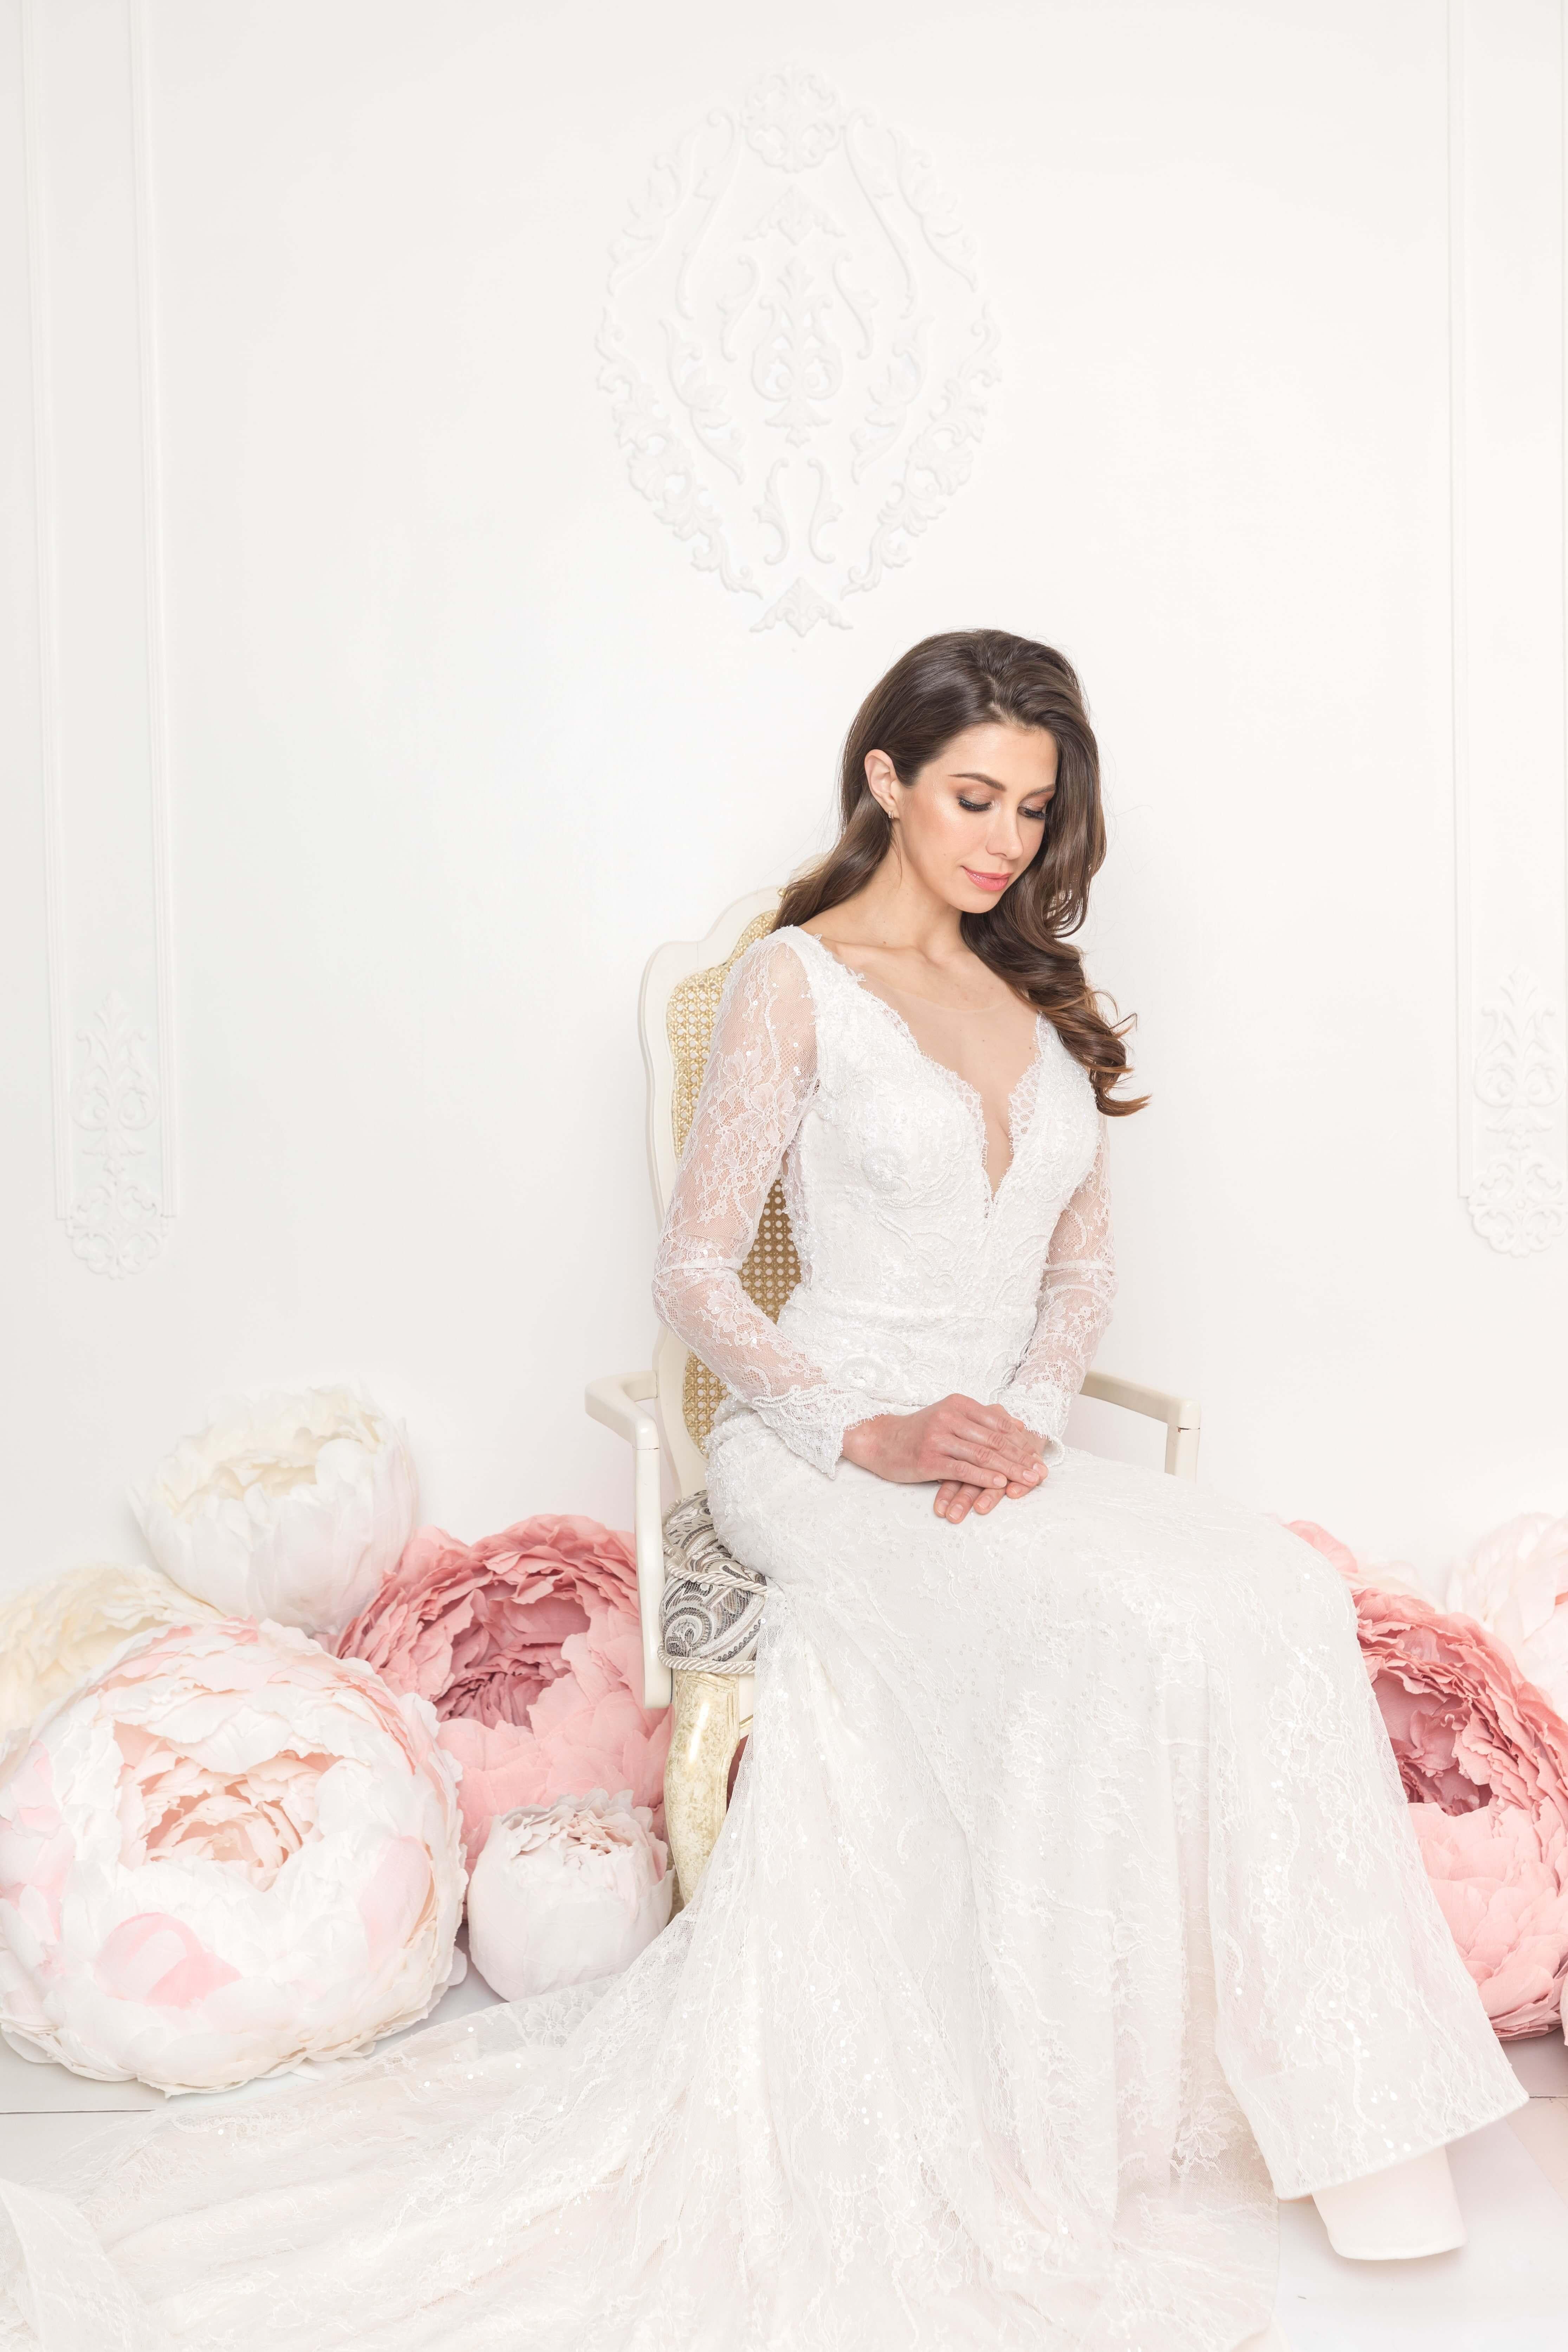 chantilly lace wedding dress lilia haute couture montreal bridal boutique